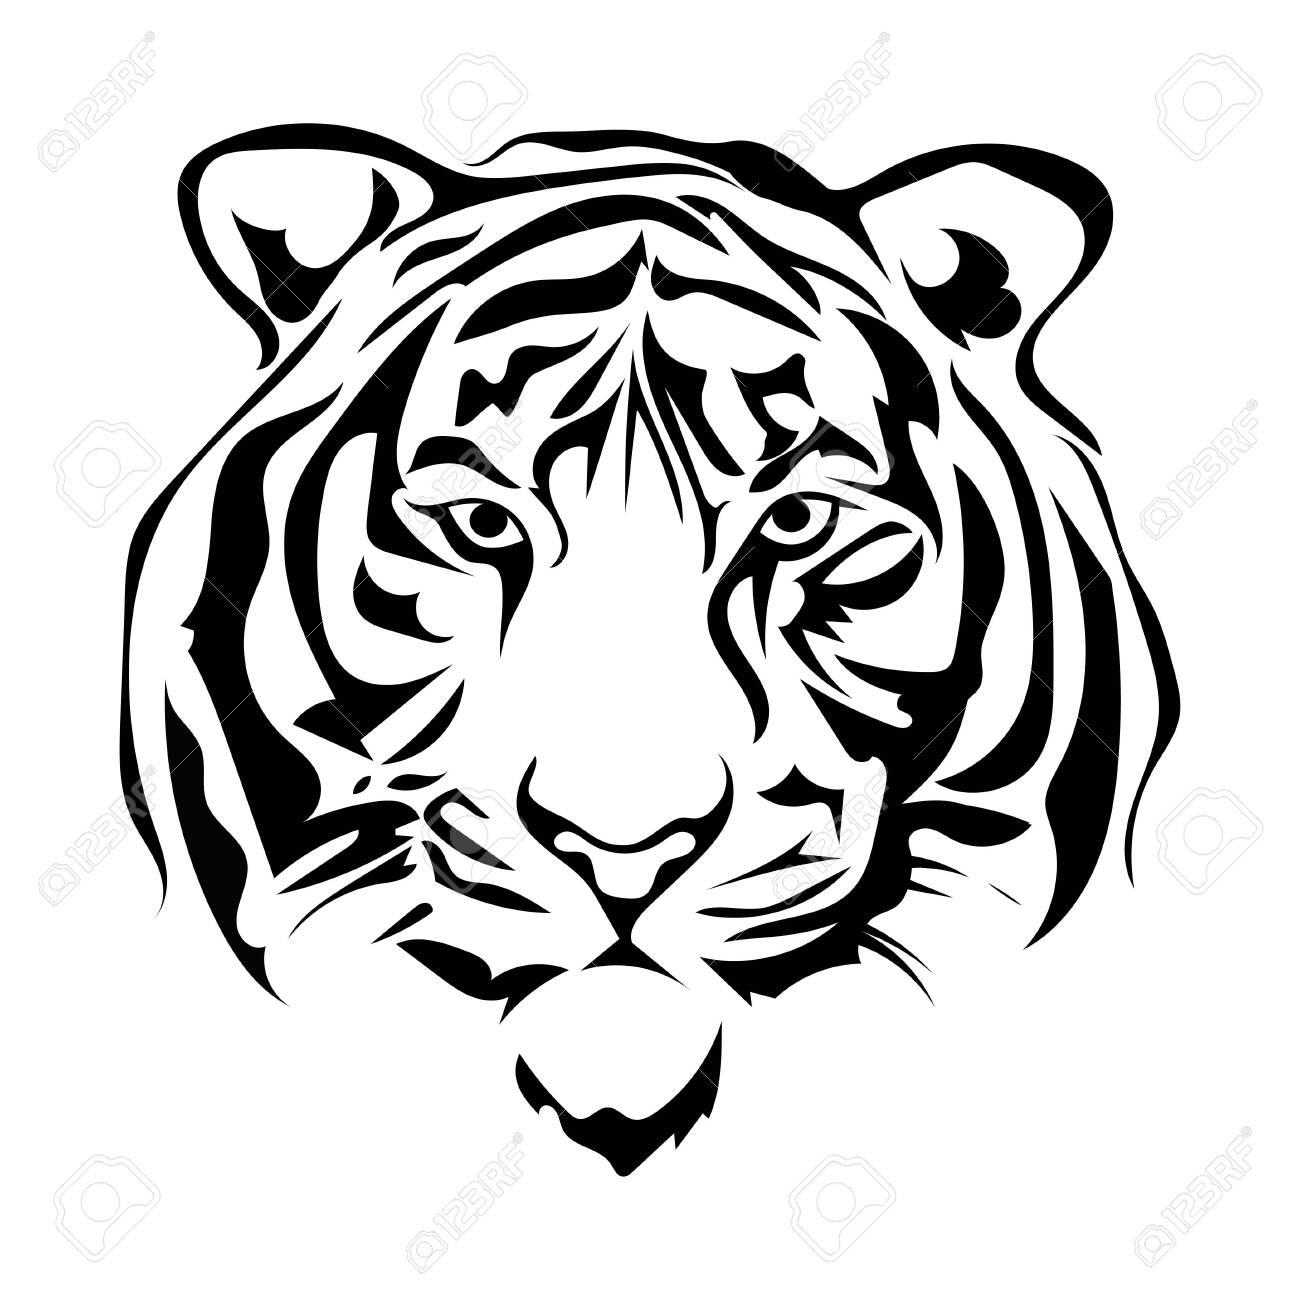 Black white illustration of a tiger head. Portrait of a predator. Tattoo wild cats. - 130391705